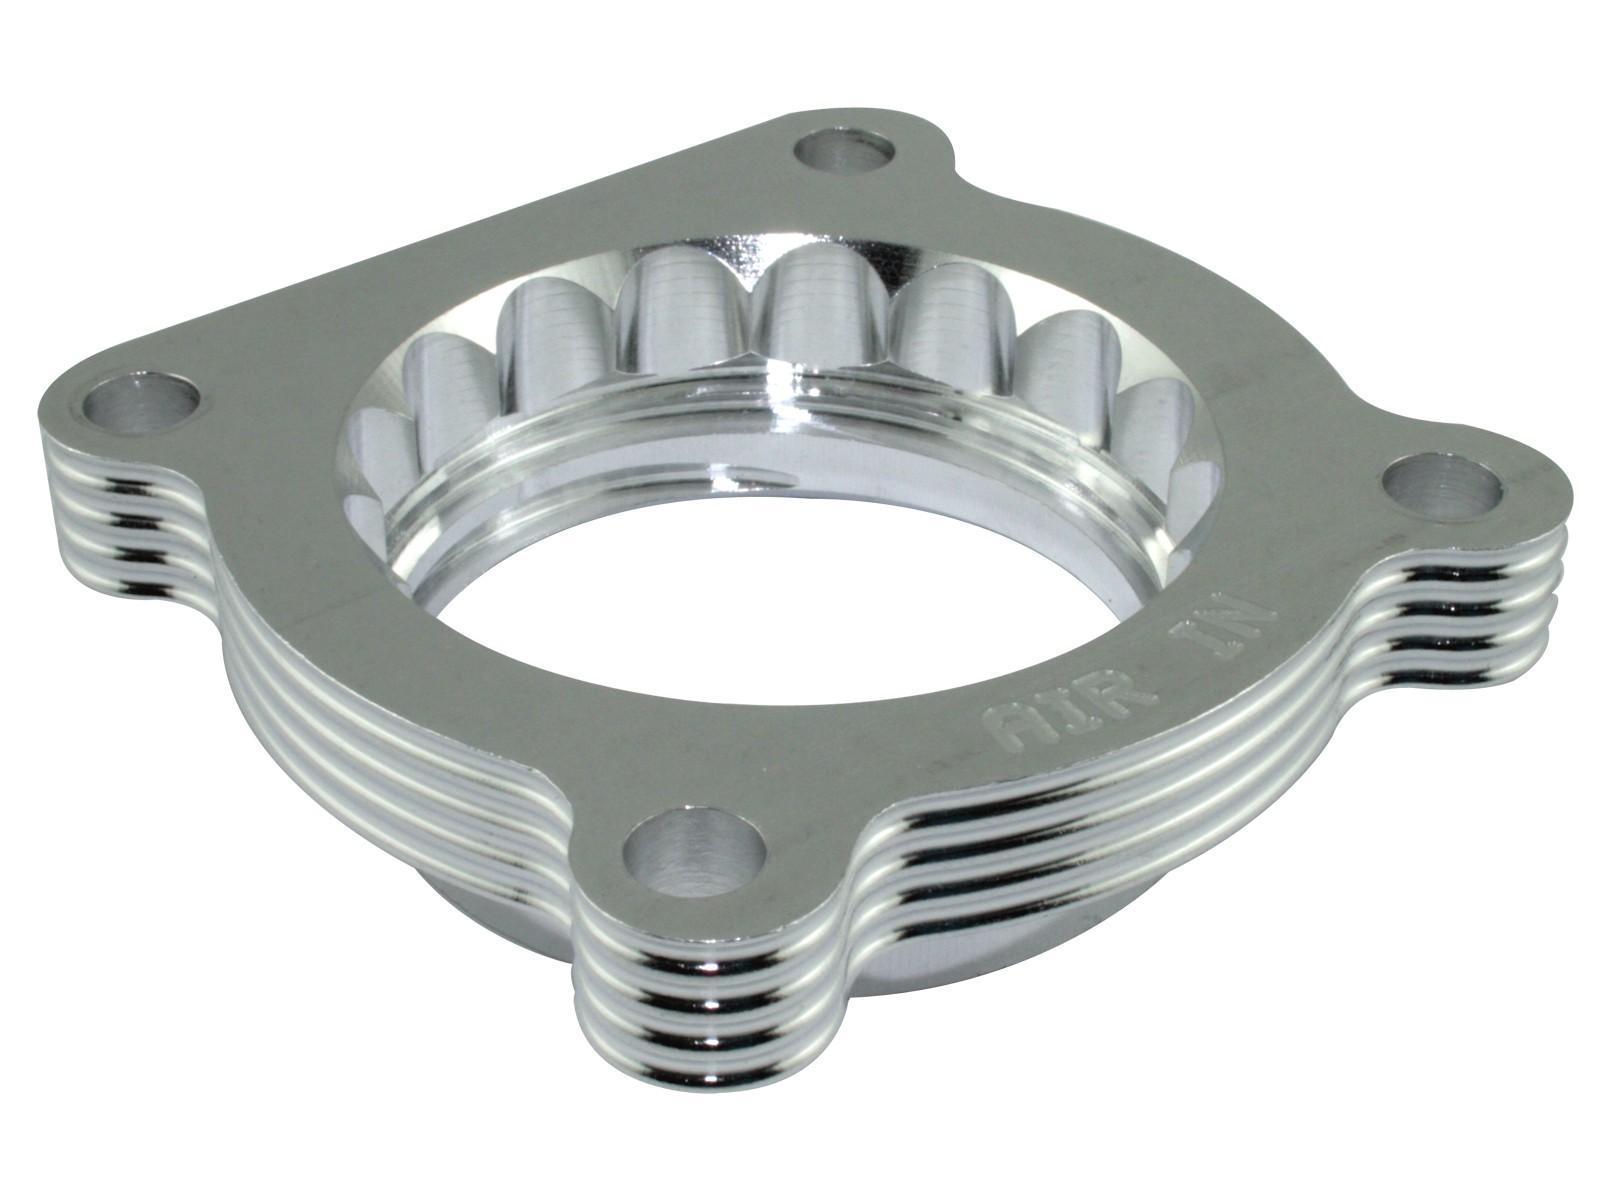 aFe POWER 46-35002 Silver Bullet Throttle Body Spacer